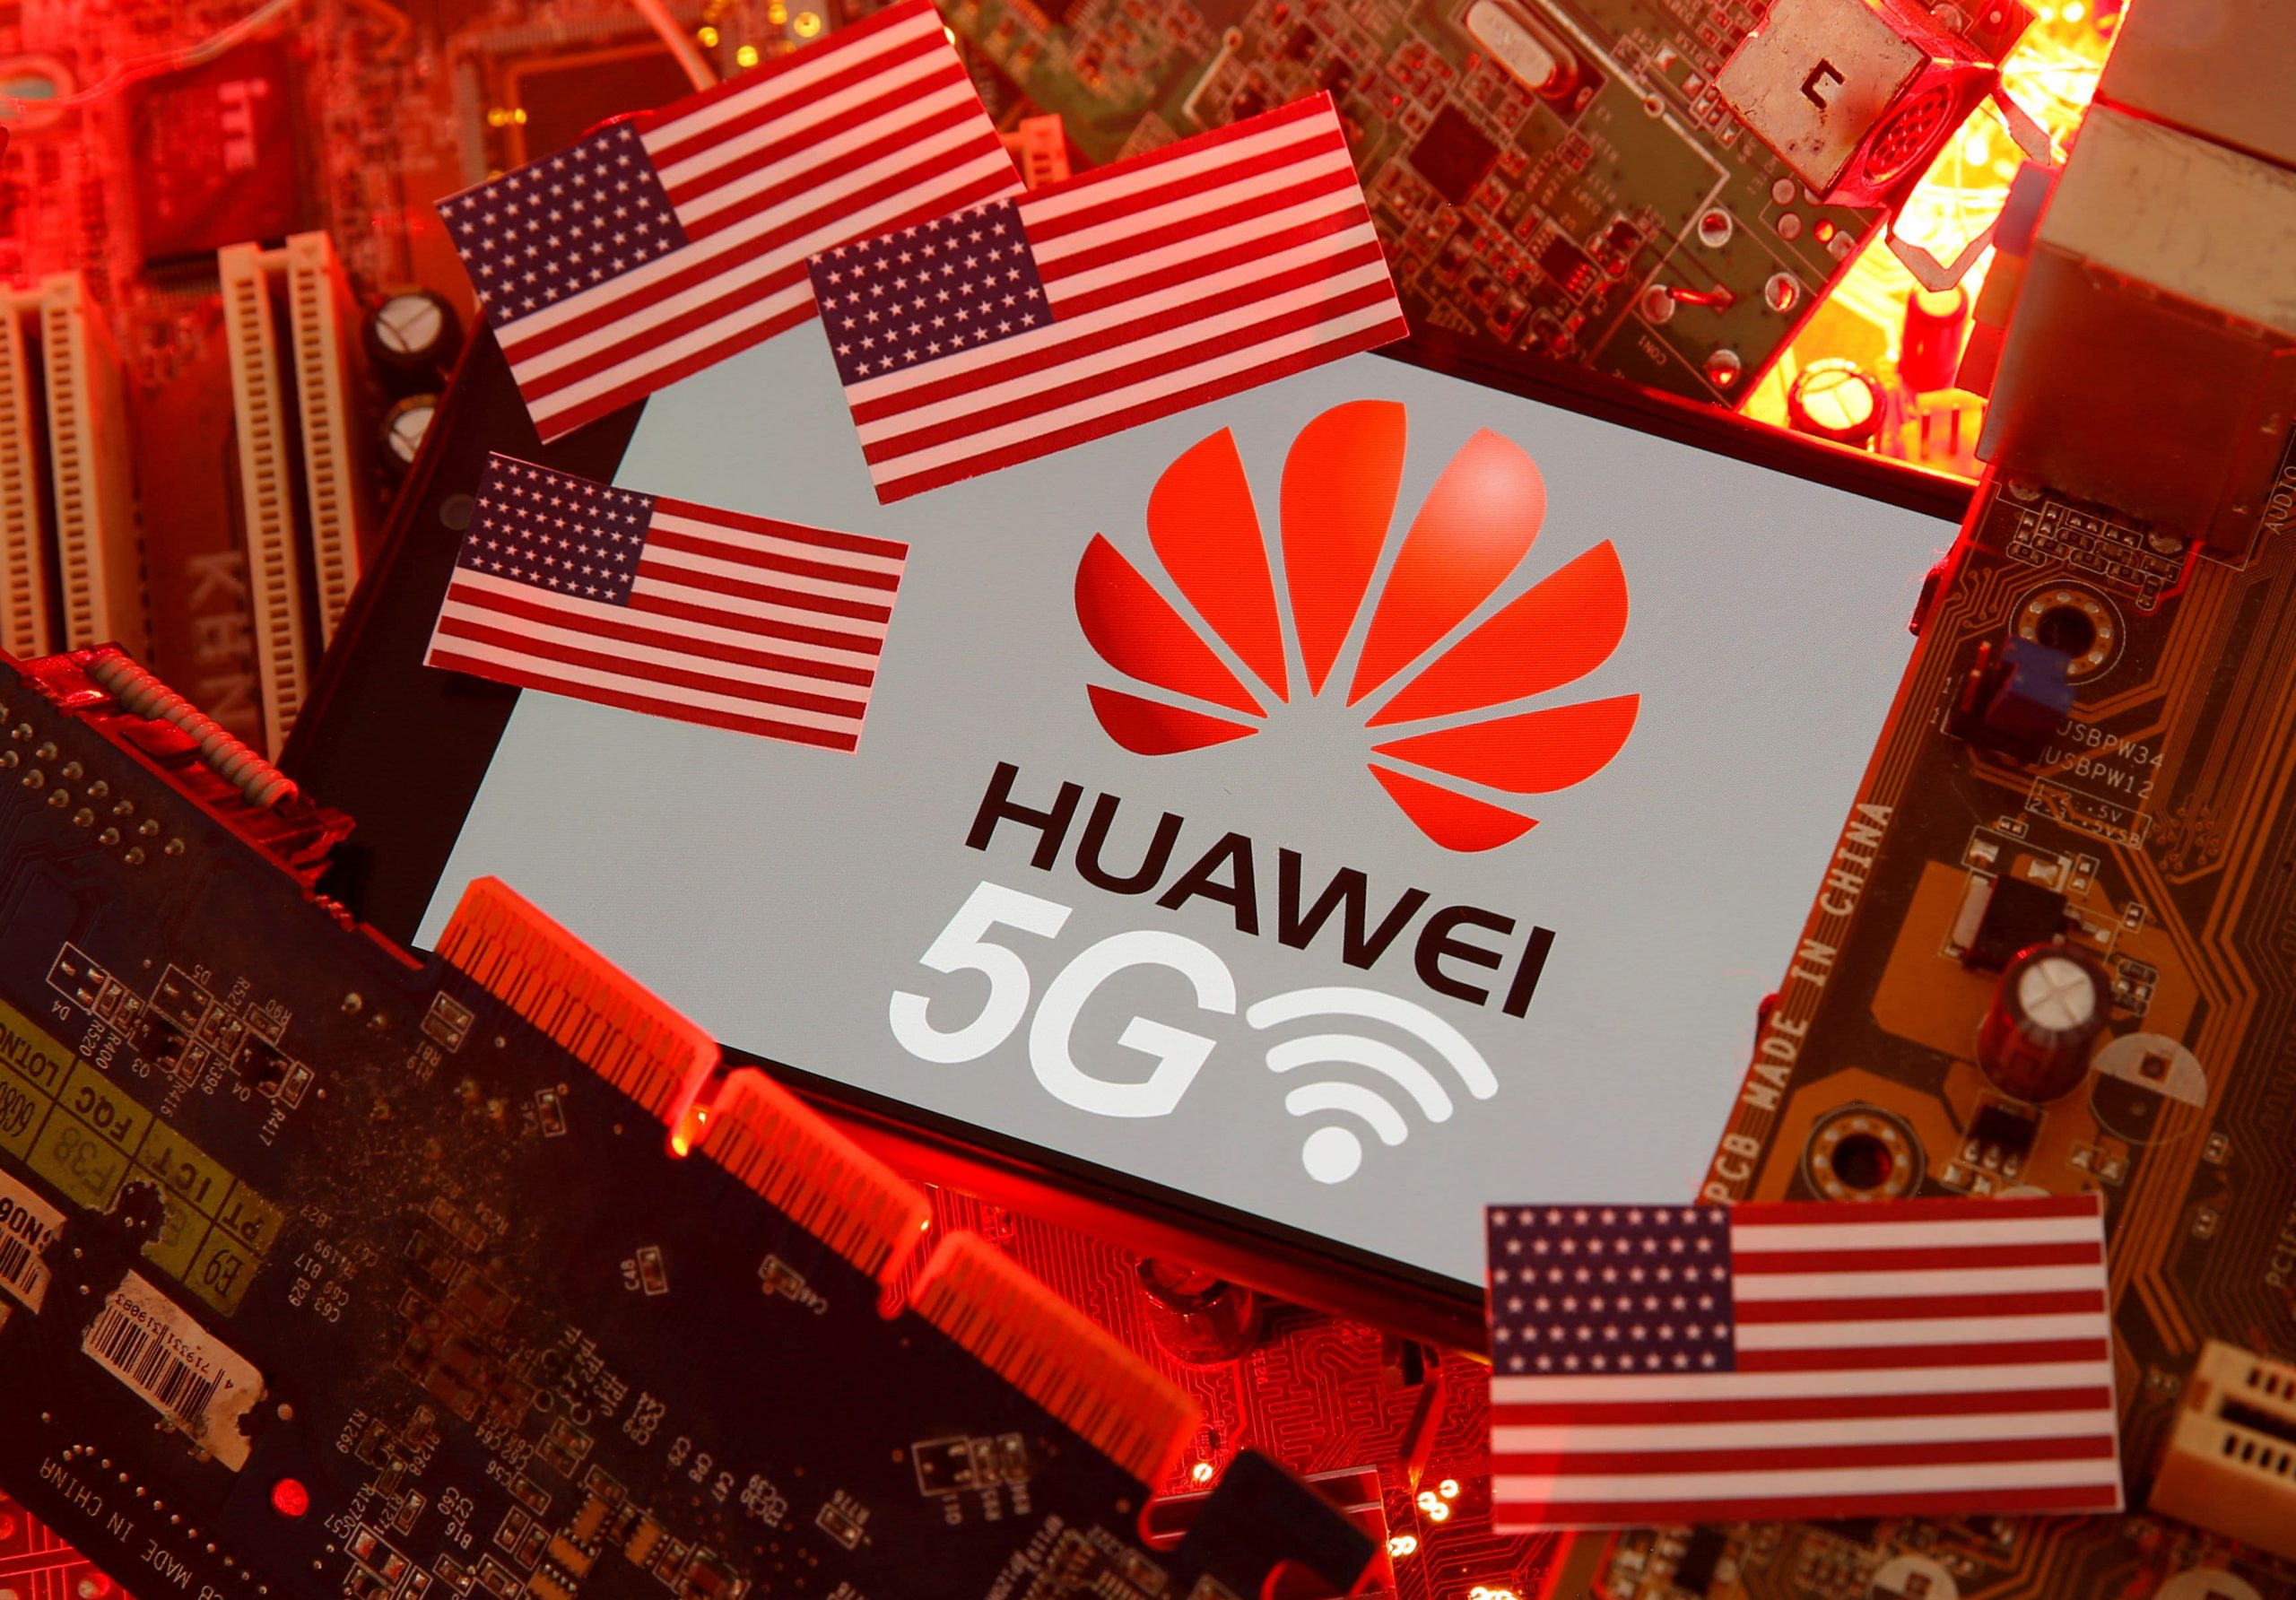 Huawei tries to blame global chip shortage on U.S. sanctions